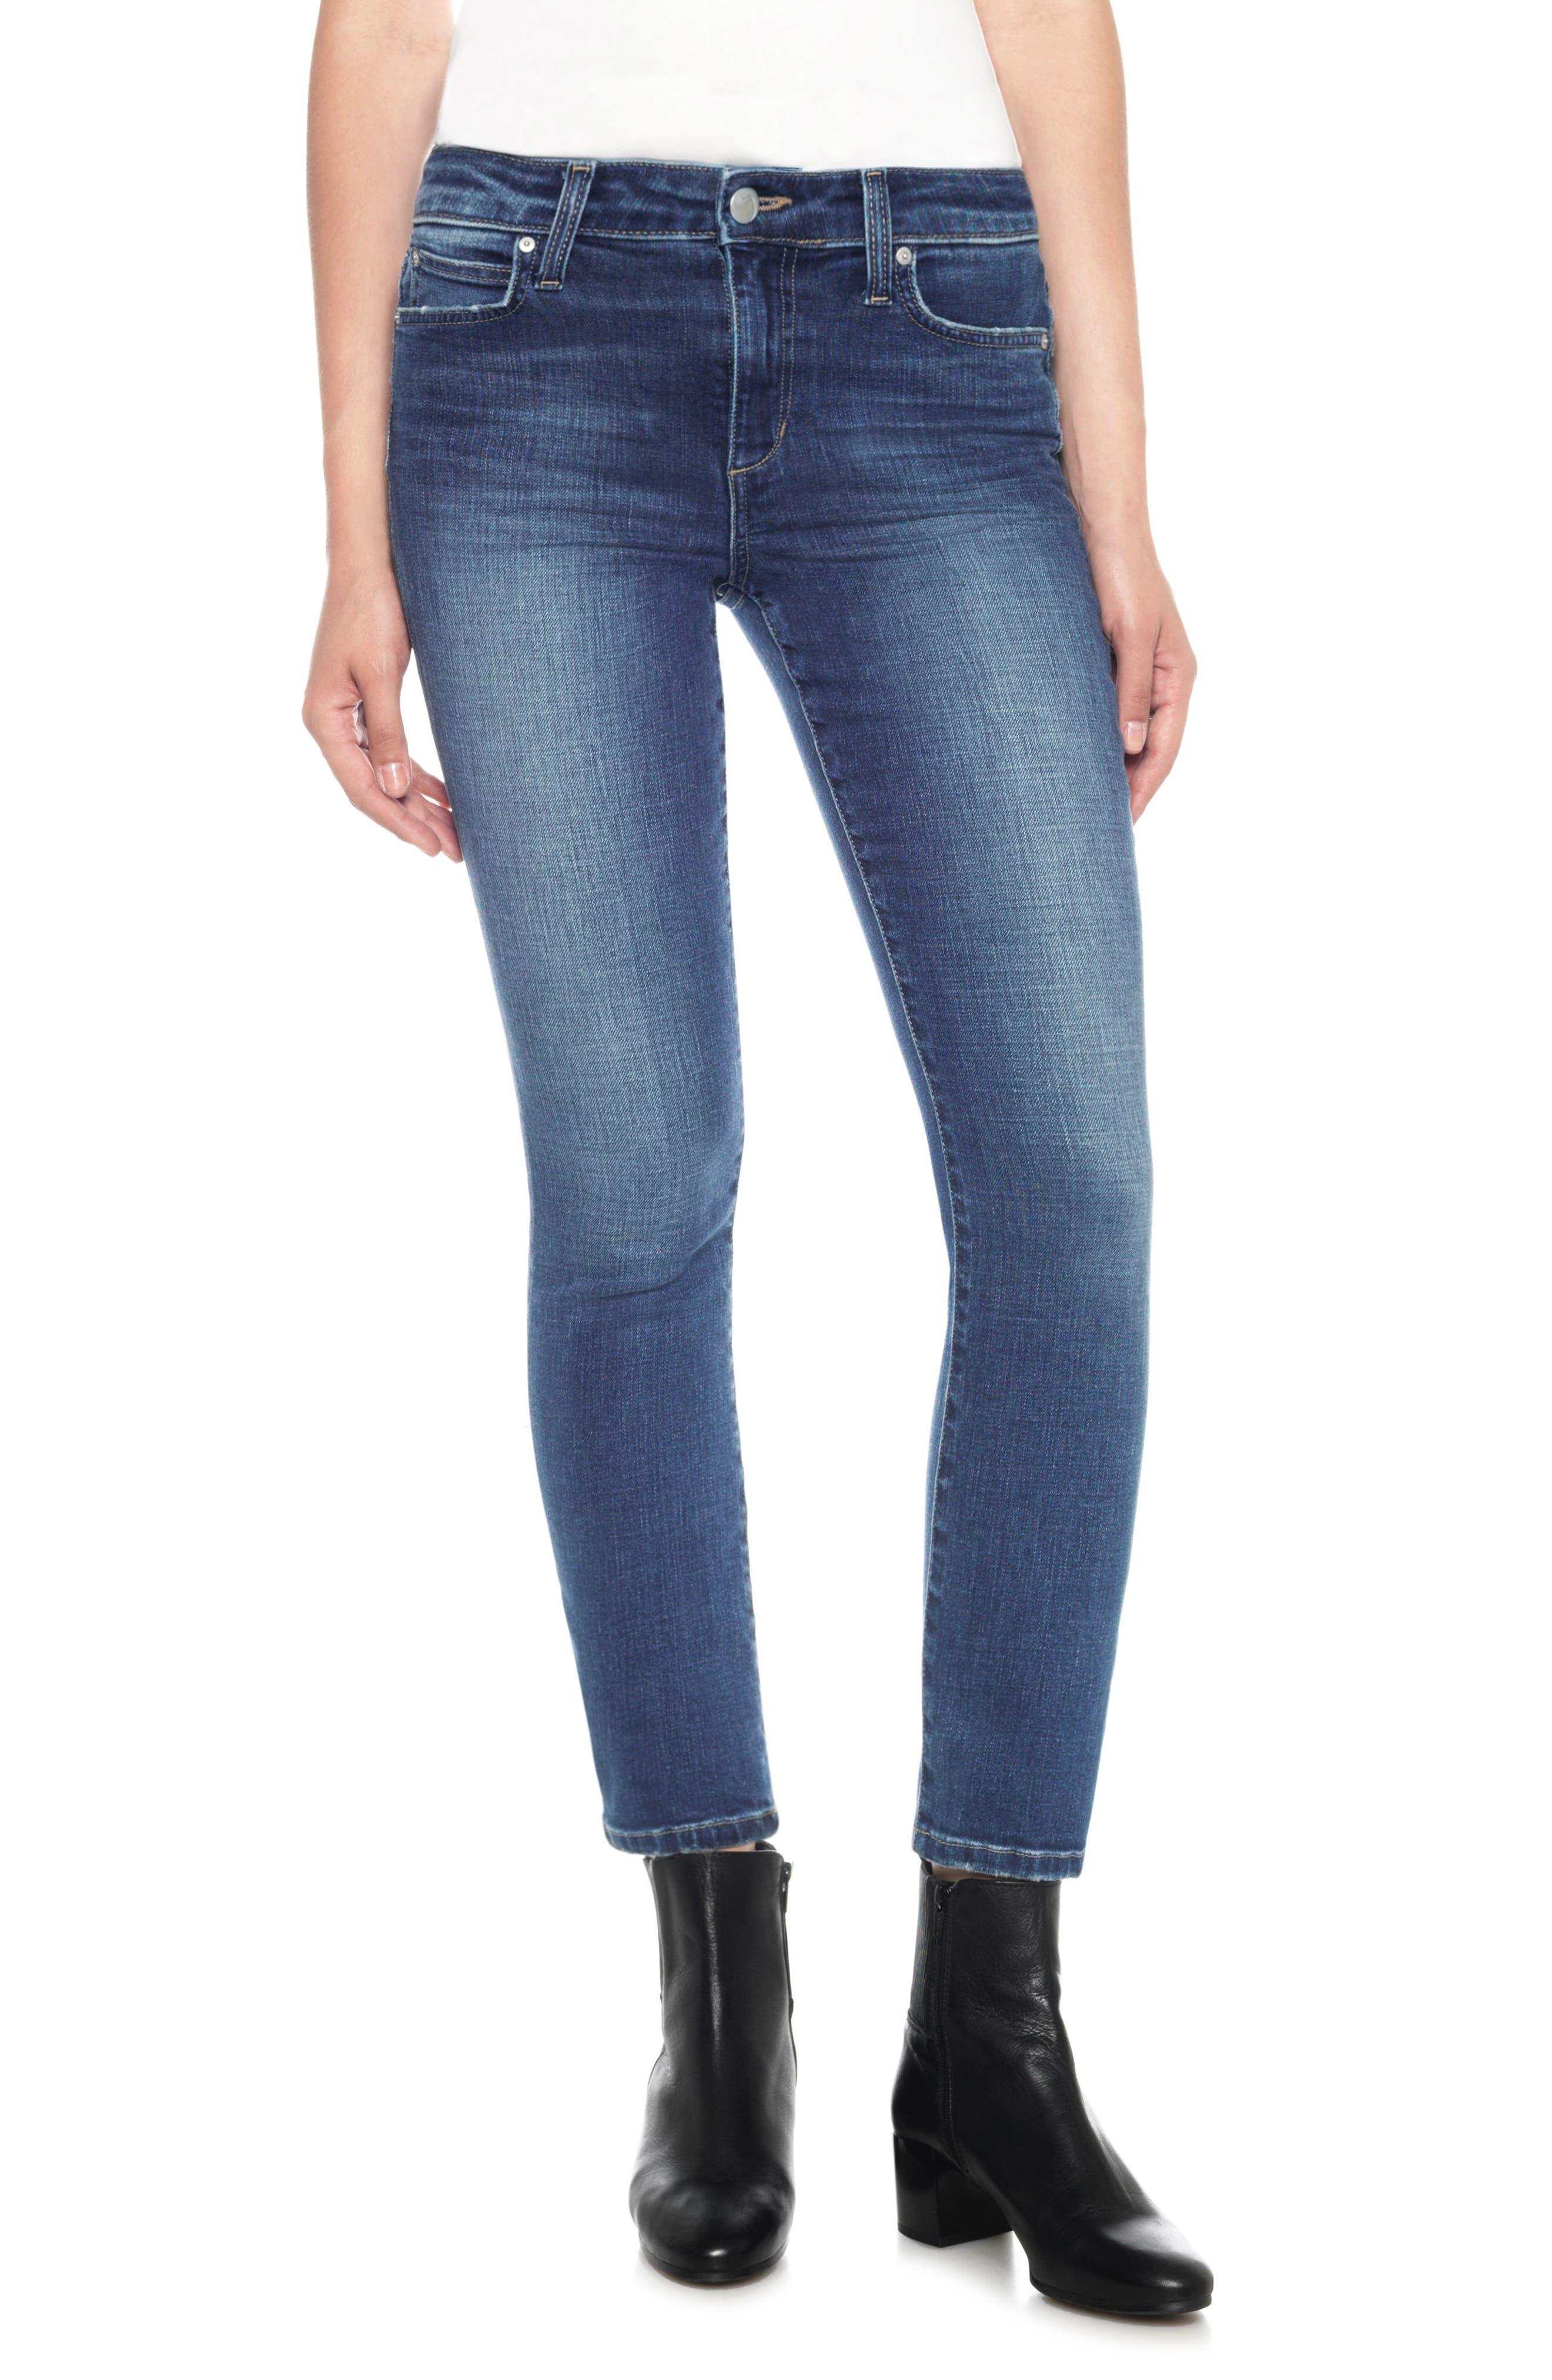 JOES Kass Ankle Skinny Jeans